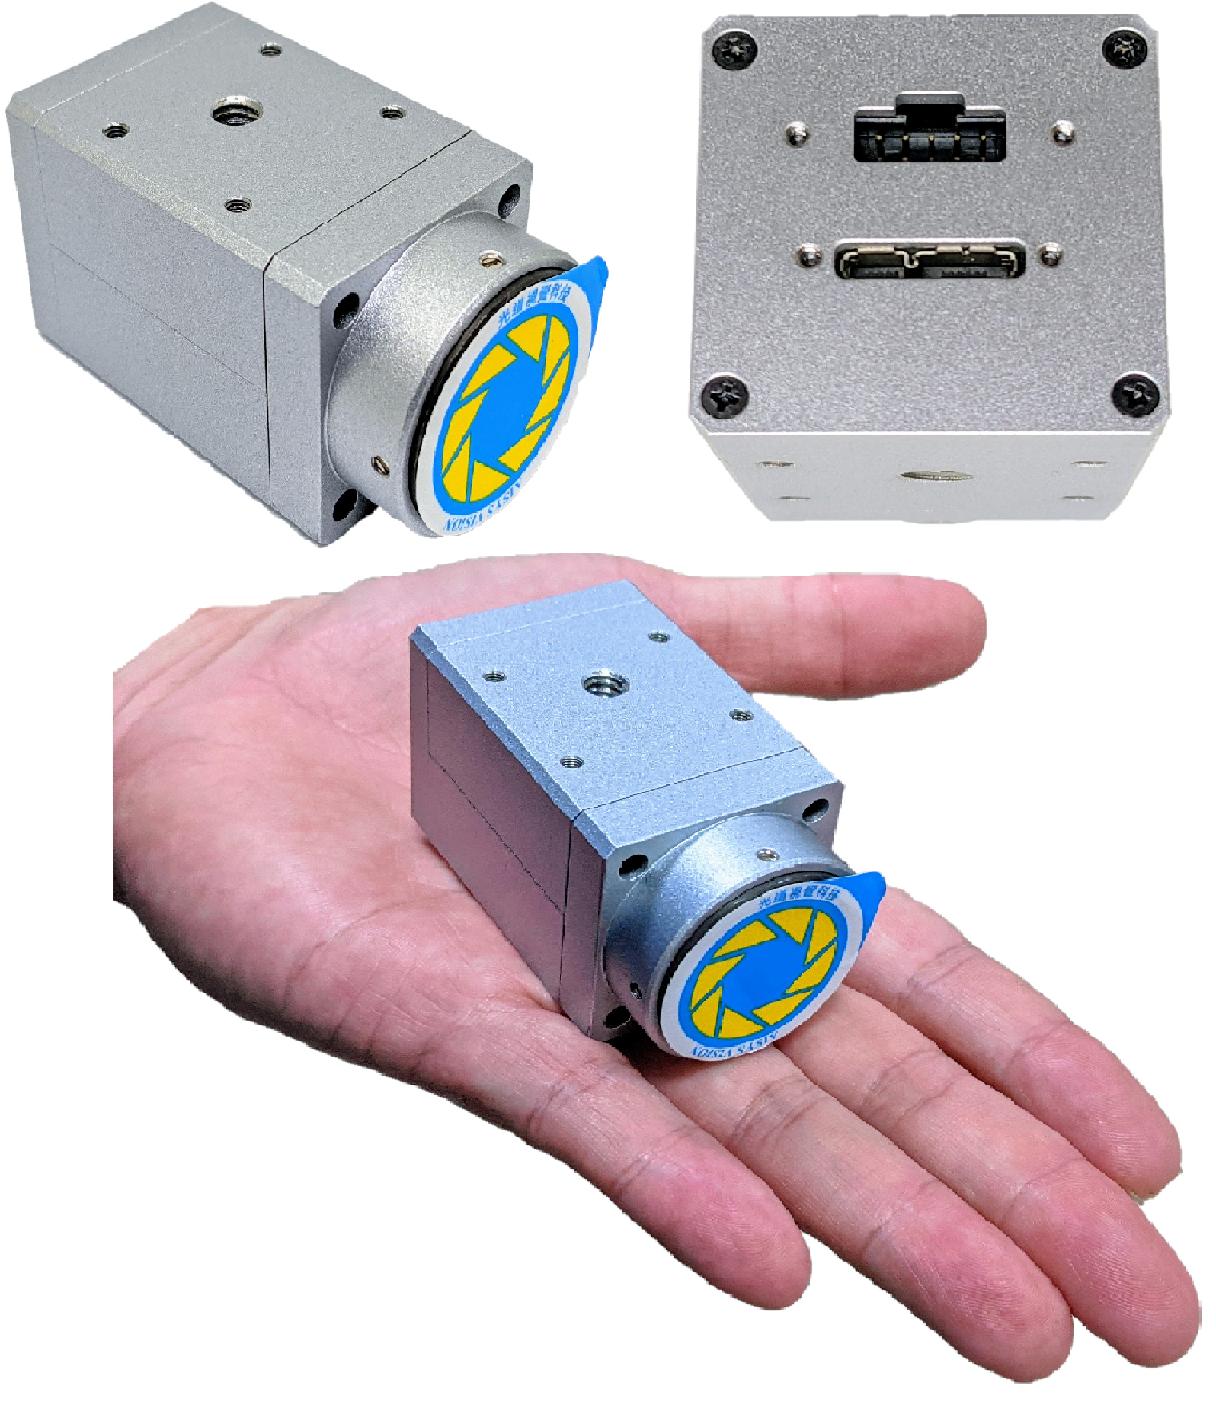 CYCLOPS SU50F-560攝影機-500K像素、非同步式、灰階、內建LED燈源控制器